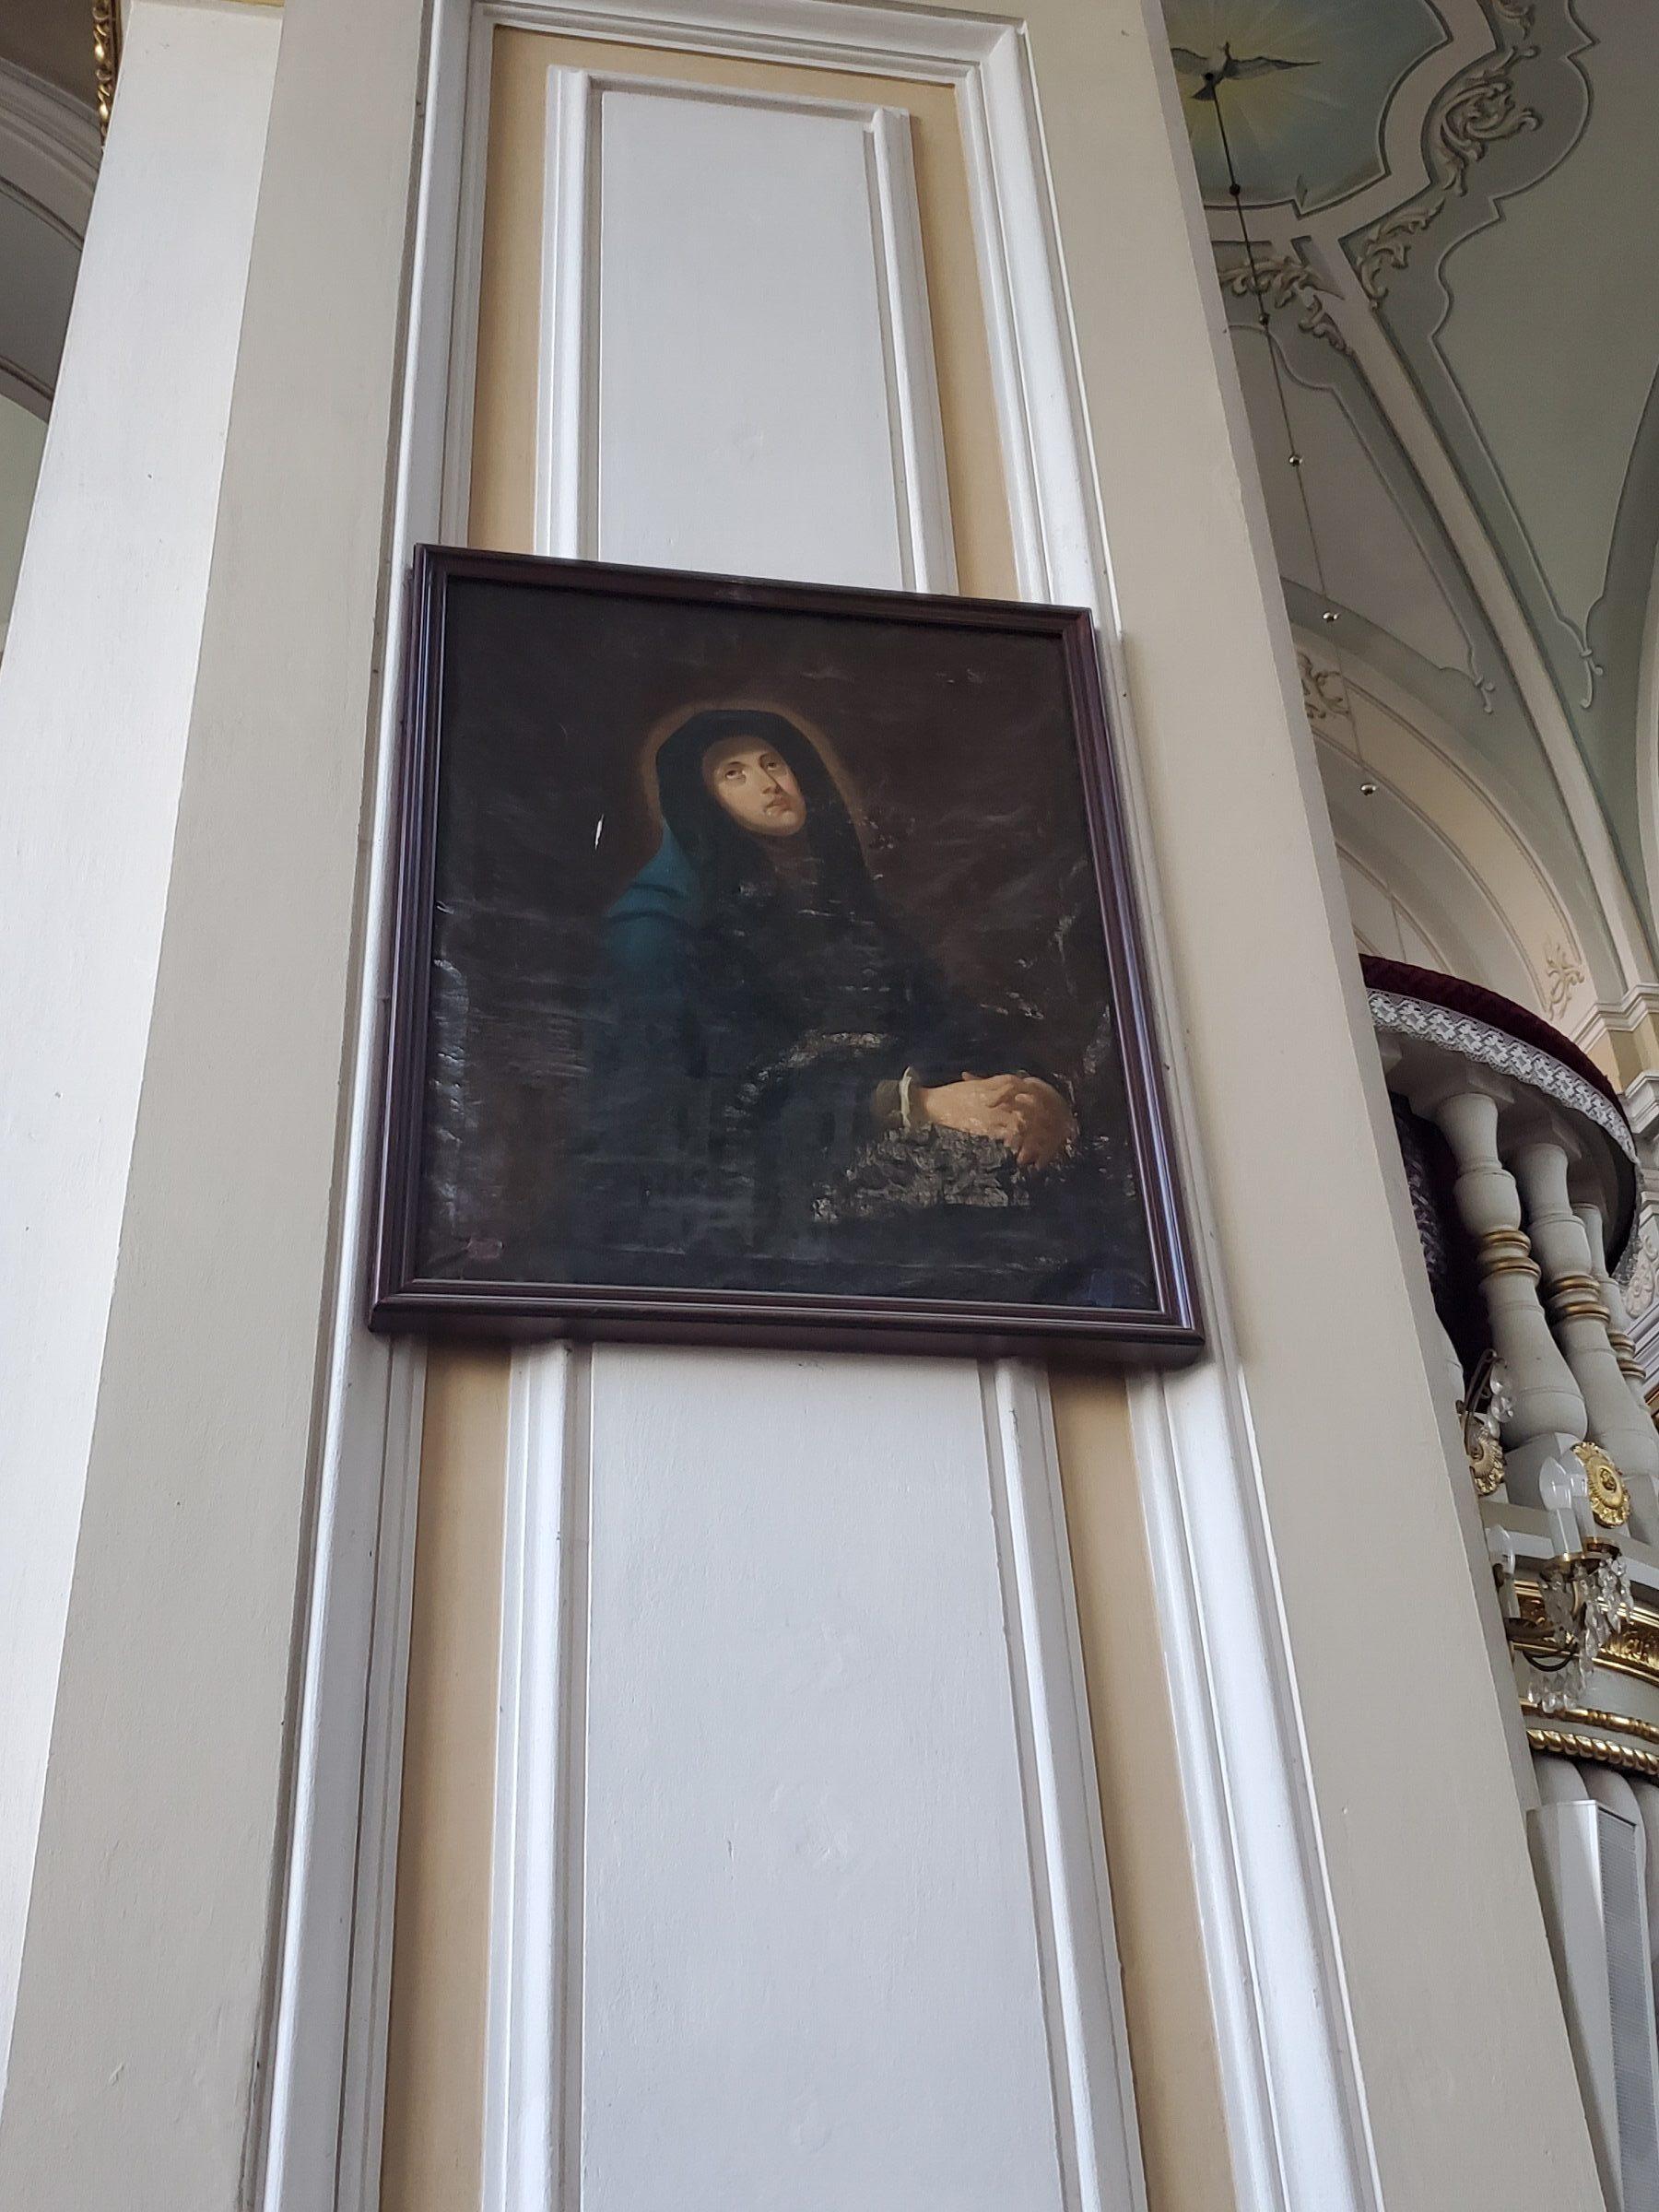 20200606 111227 rotated e1605867811658 - Костел Святого Андрея Баболи в Лынтупах